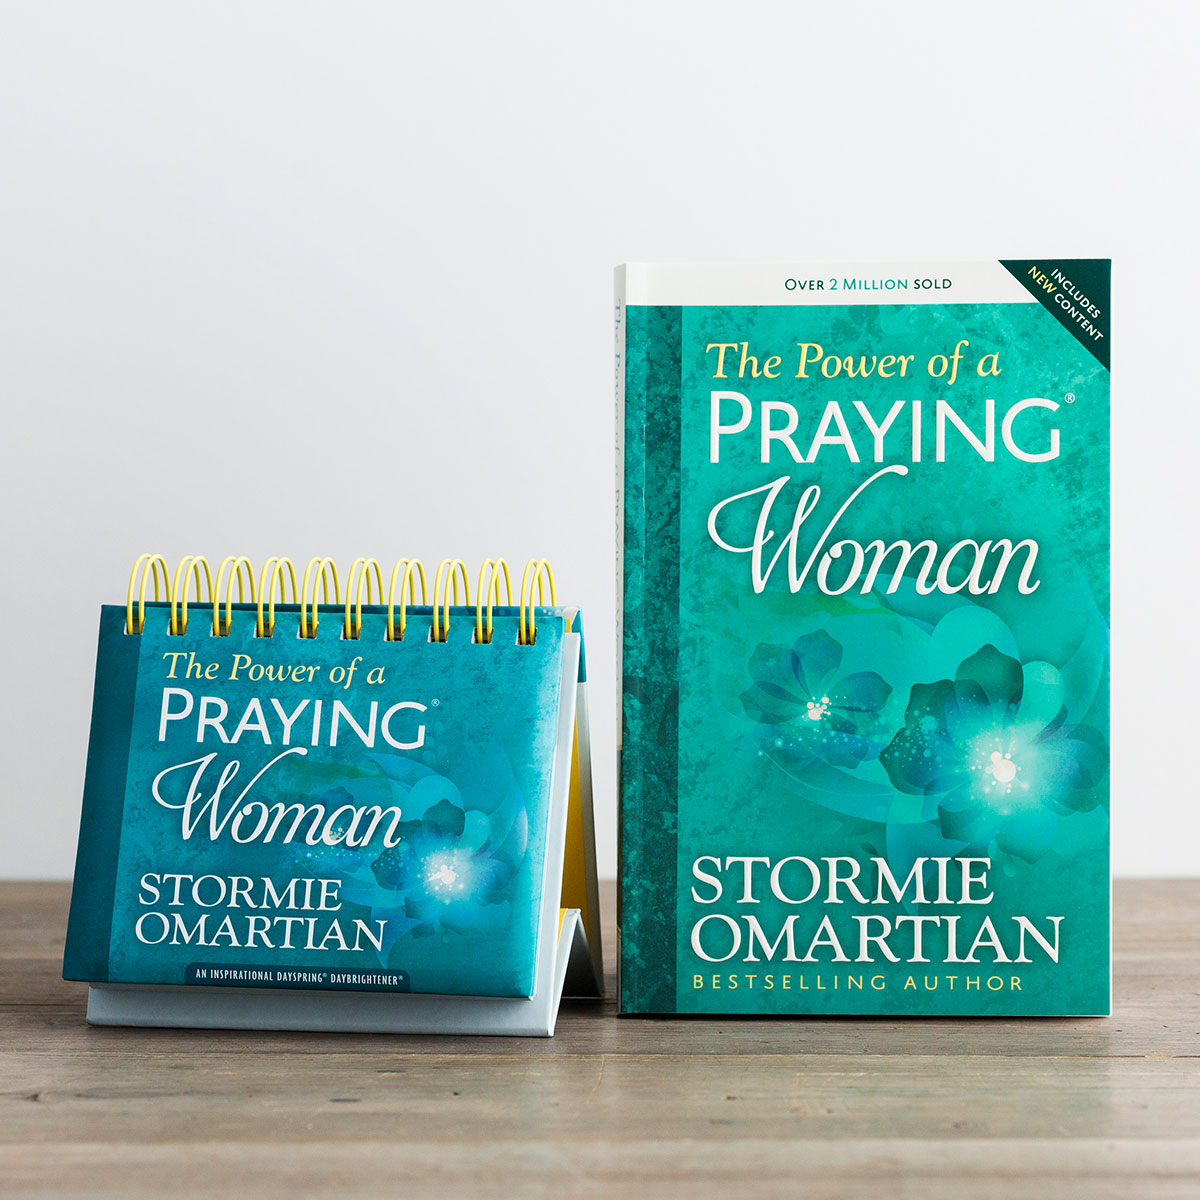 The Power of a Praying Woman - Book & Perpetual Calendar Gift Set